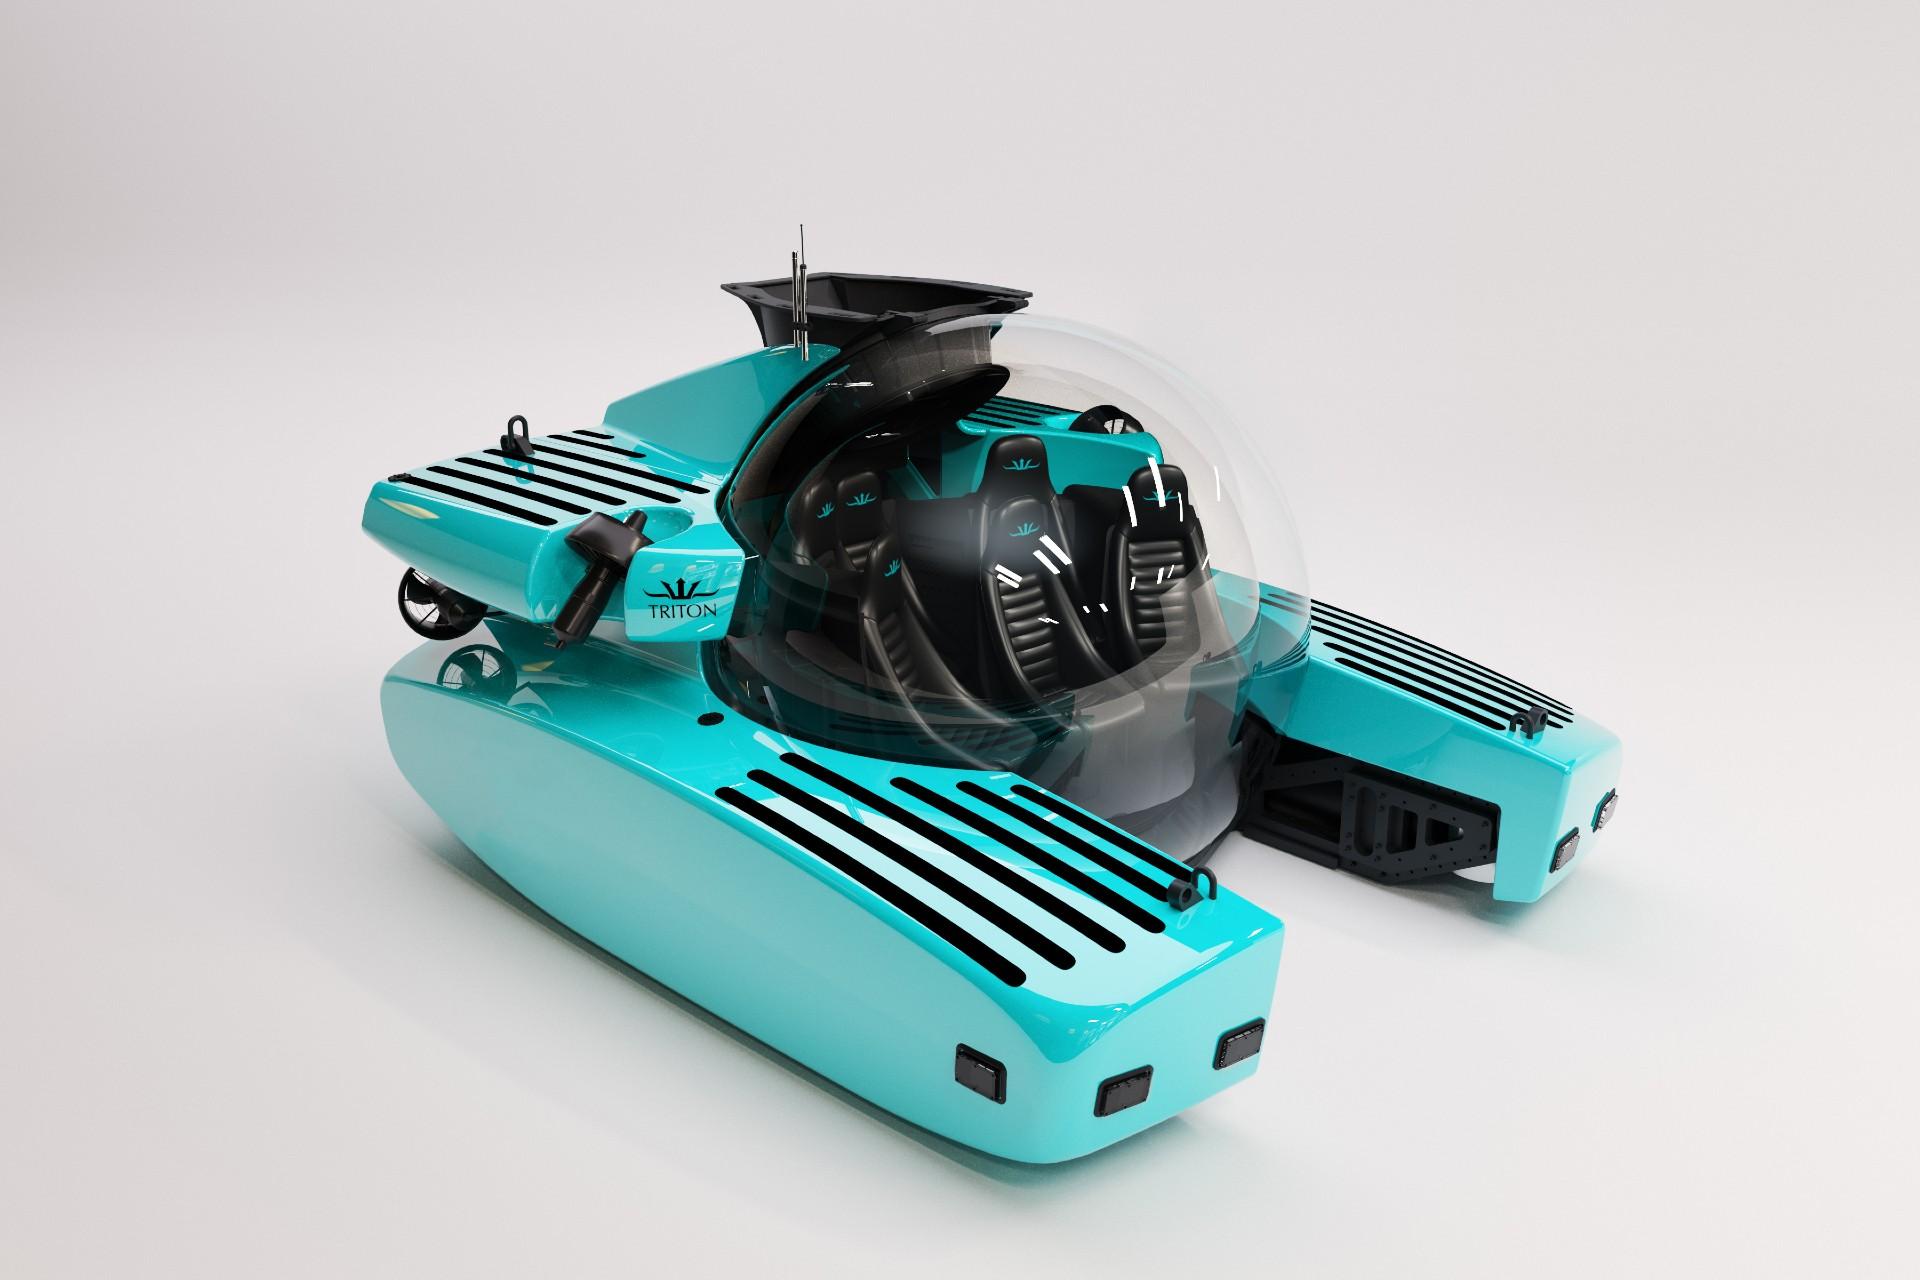 Triton's-3300/-submarine-with an-iconic-tiffany-blue exterior